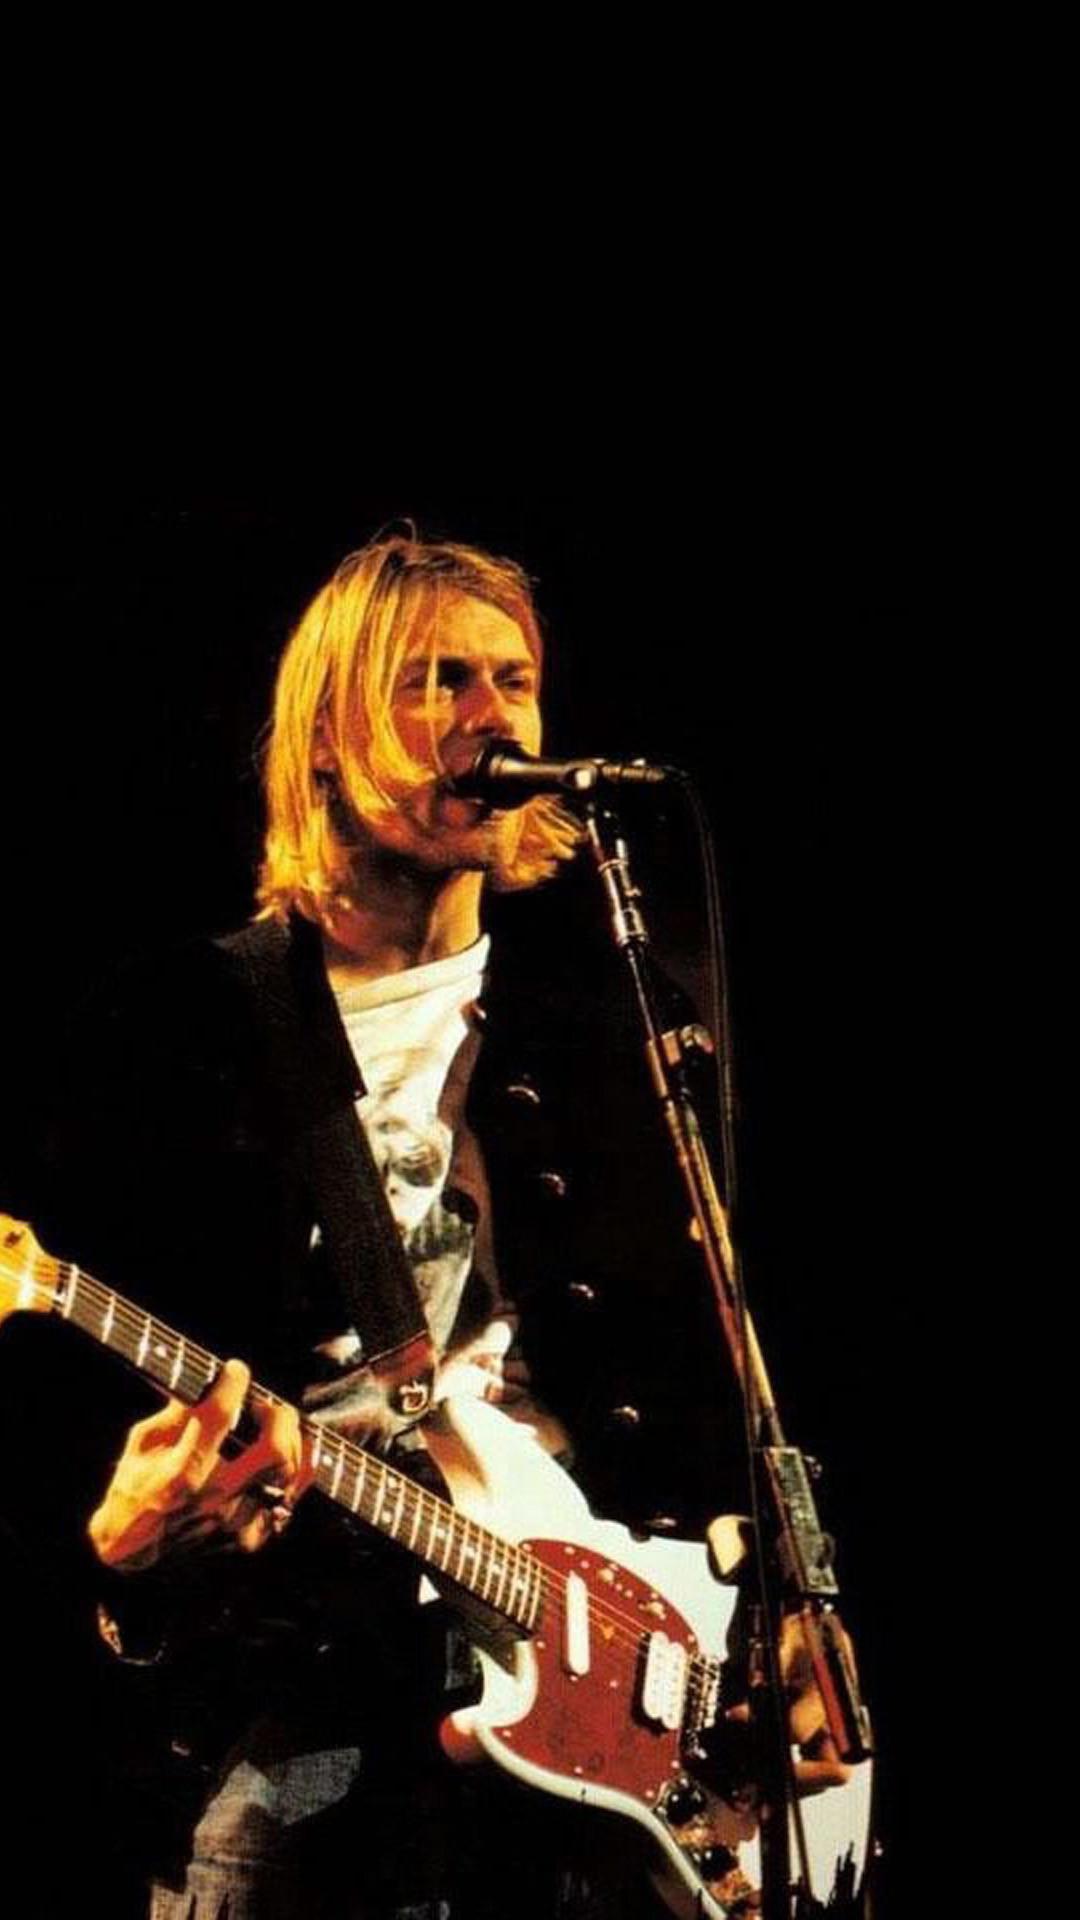 Nirvana wallpapers 65 images - Kurt cobain nirvana wallpaper ...